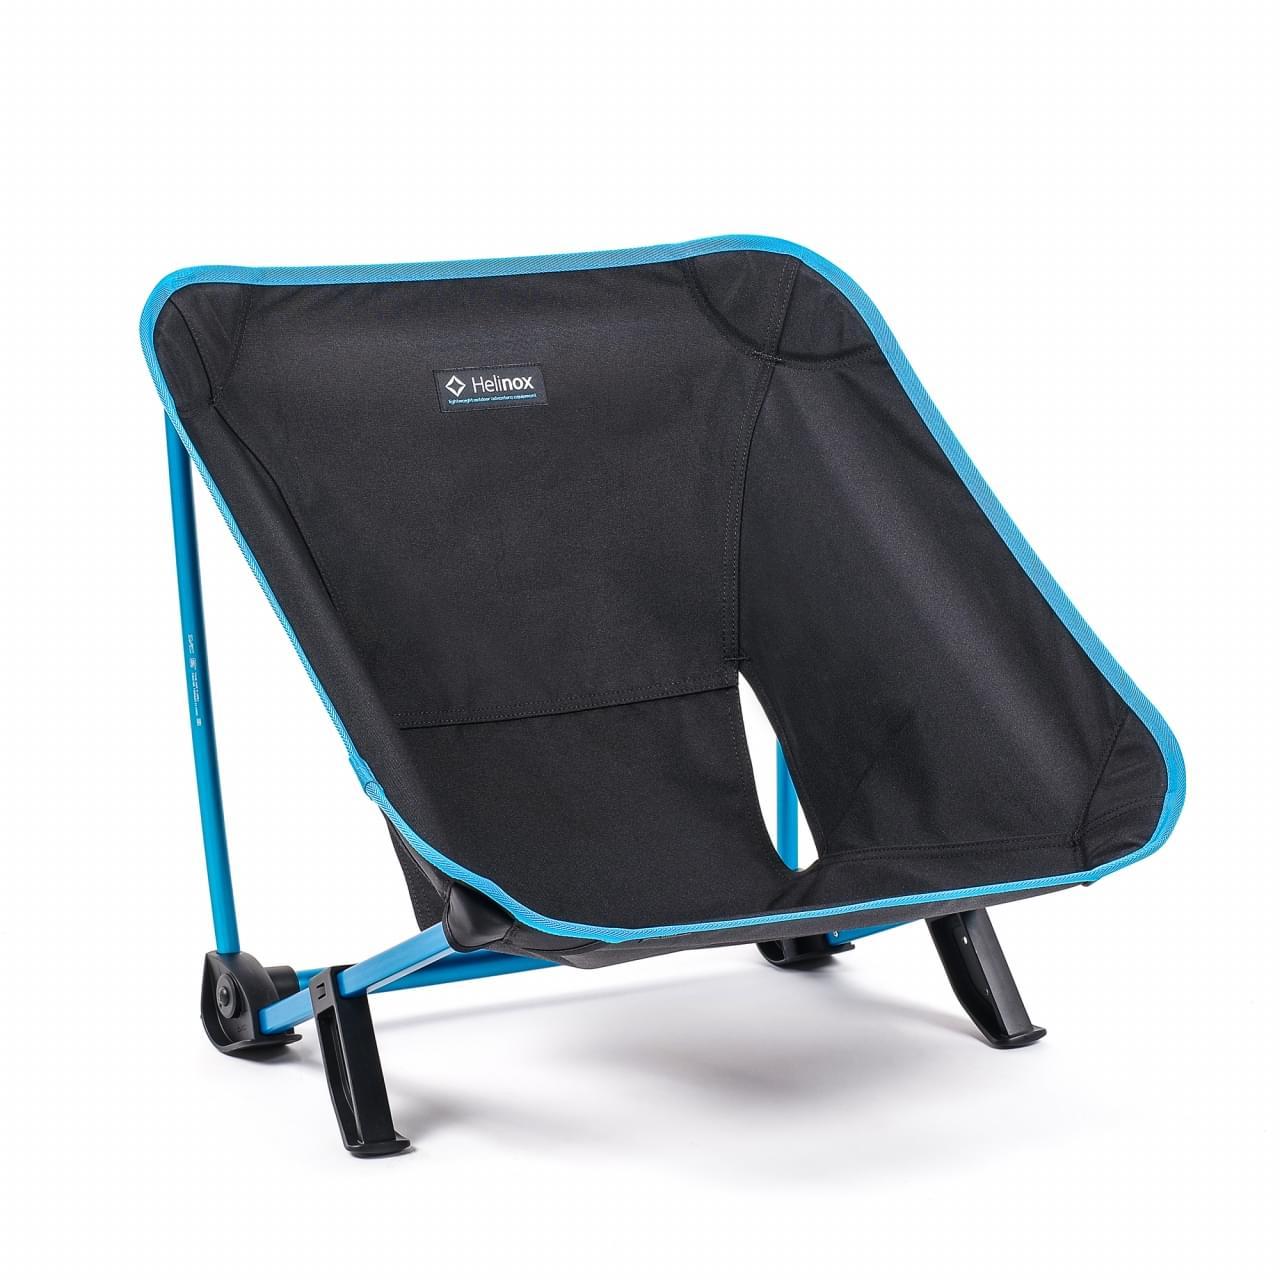 Helinox Incline Festival Chair Lichtgewicht Stoel Zwart